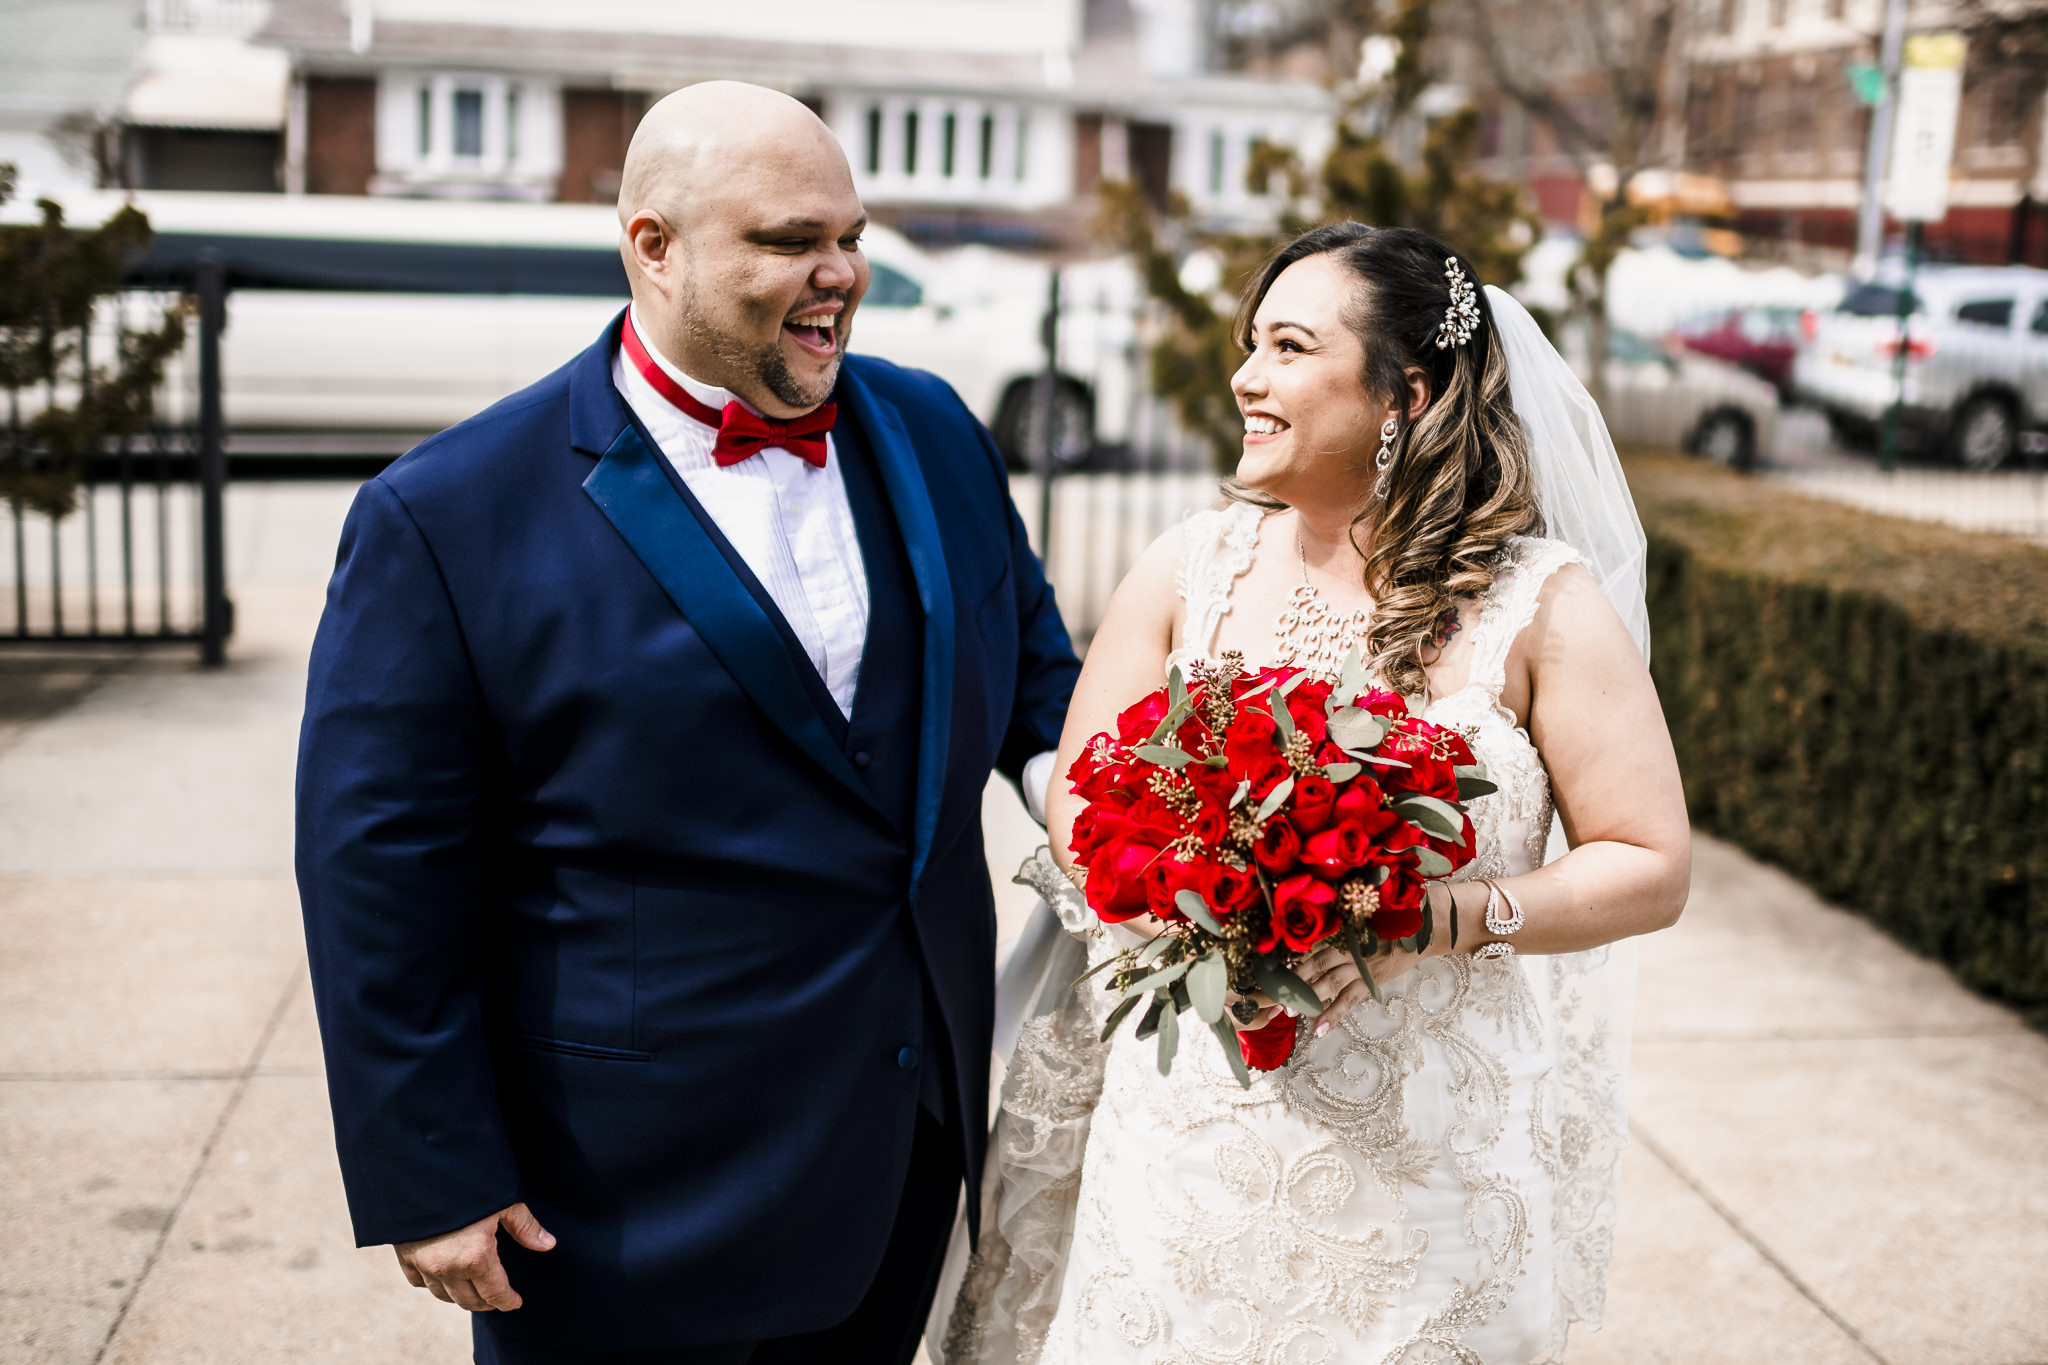 Sanchez-Leonards-Palazzo-New-York-Wedding-Photographer-15.JPG